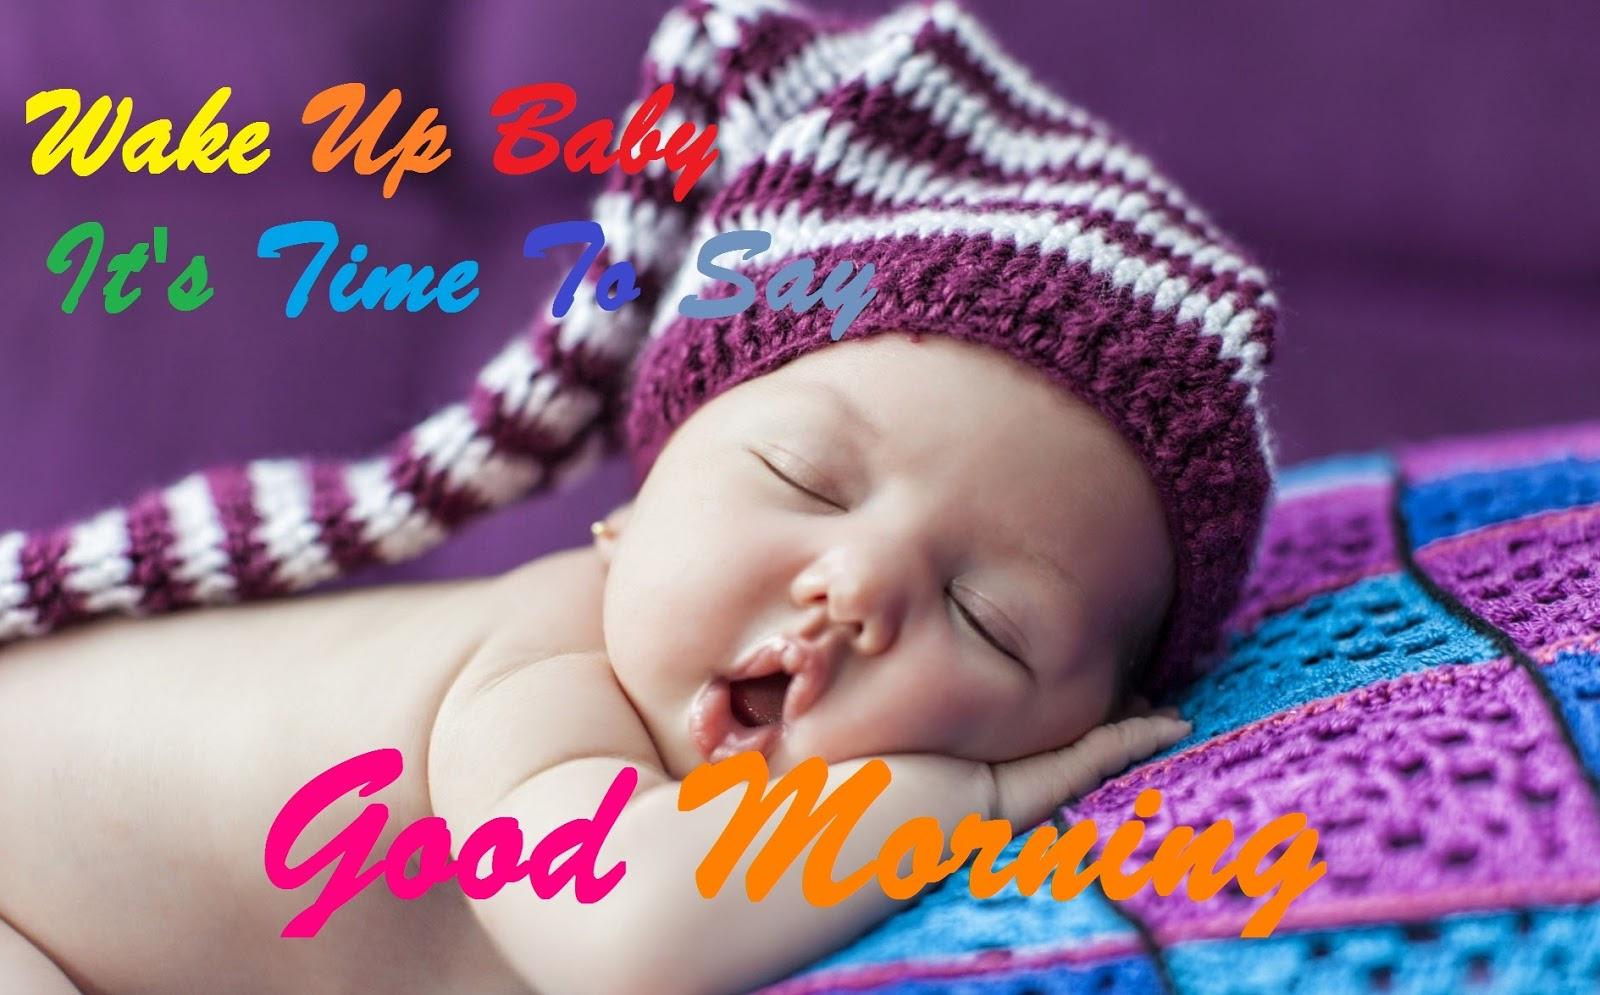 Good Morning Whatsapp Cute Baby Wallpaper Download High Resolution 4k Wallpaper